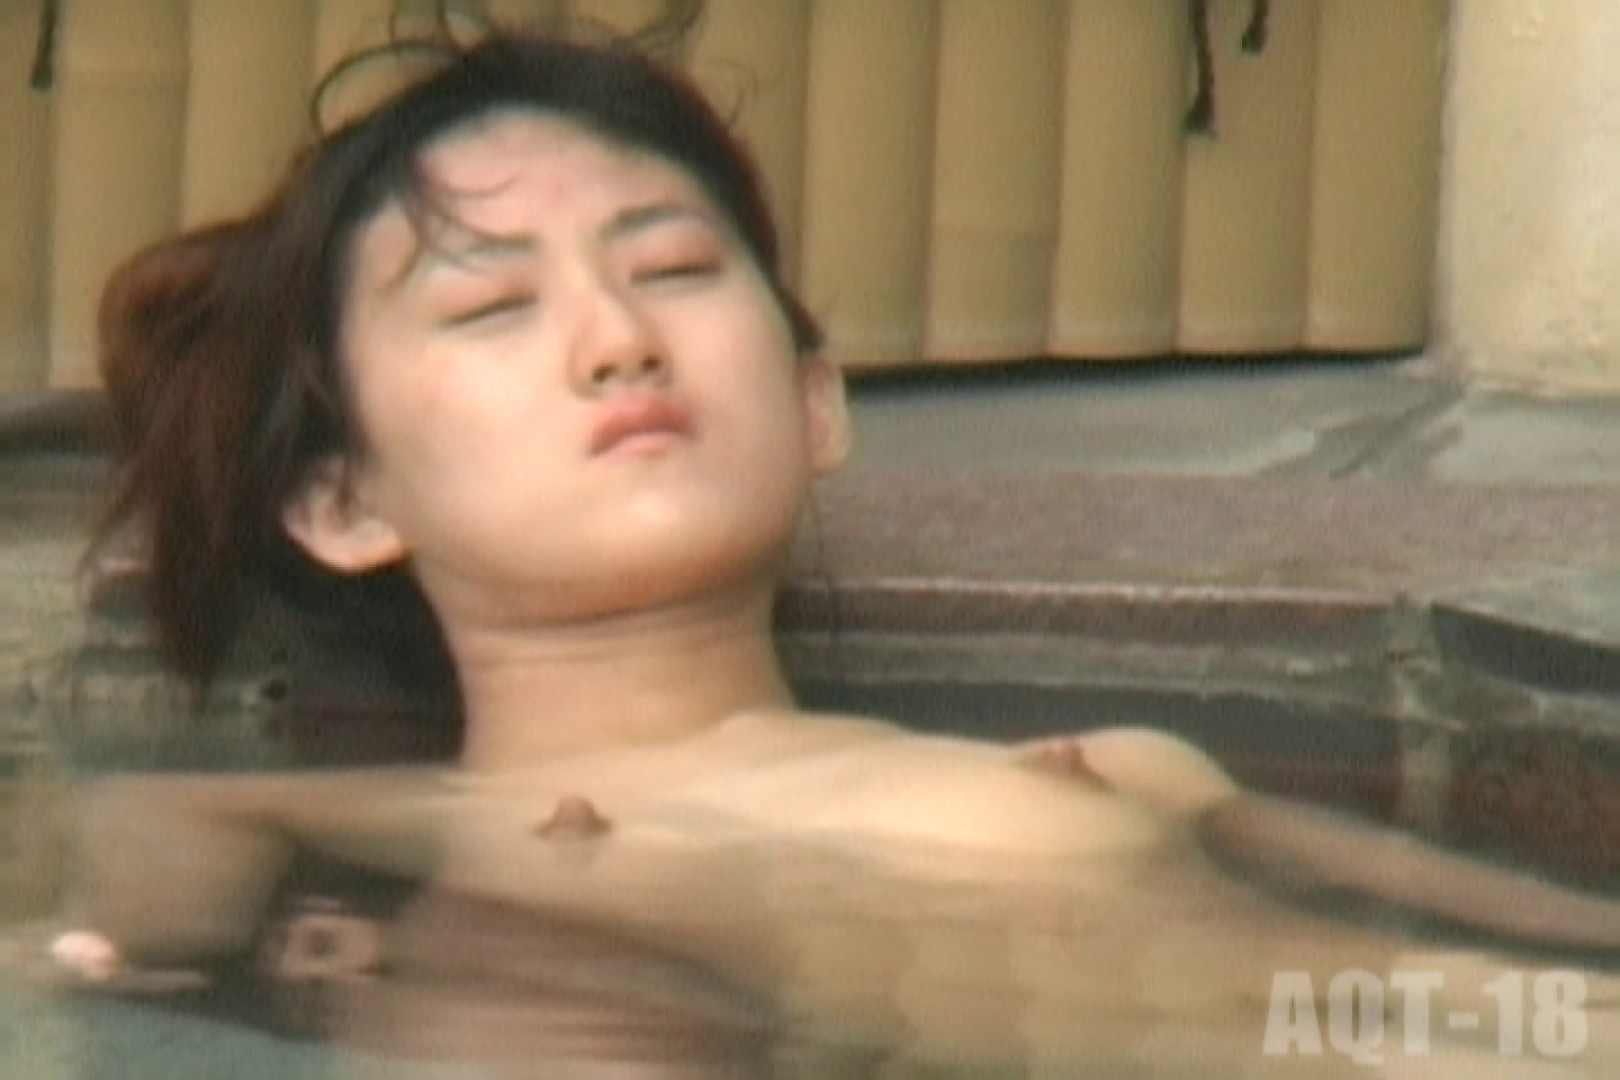 Aquaな露天風呂Vol.862 盗撮師作品  99pic 72